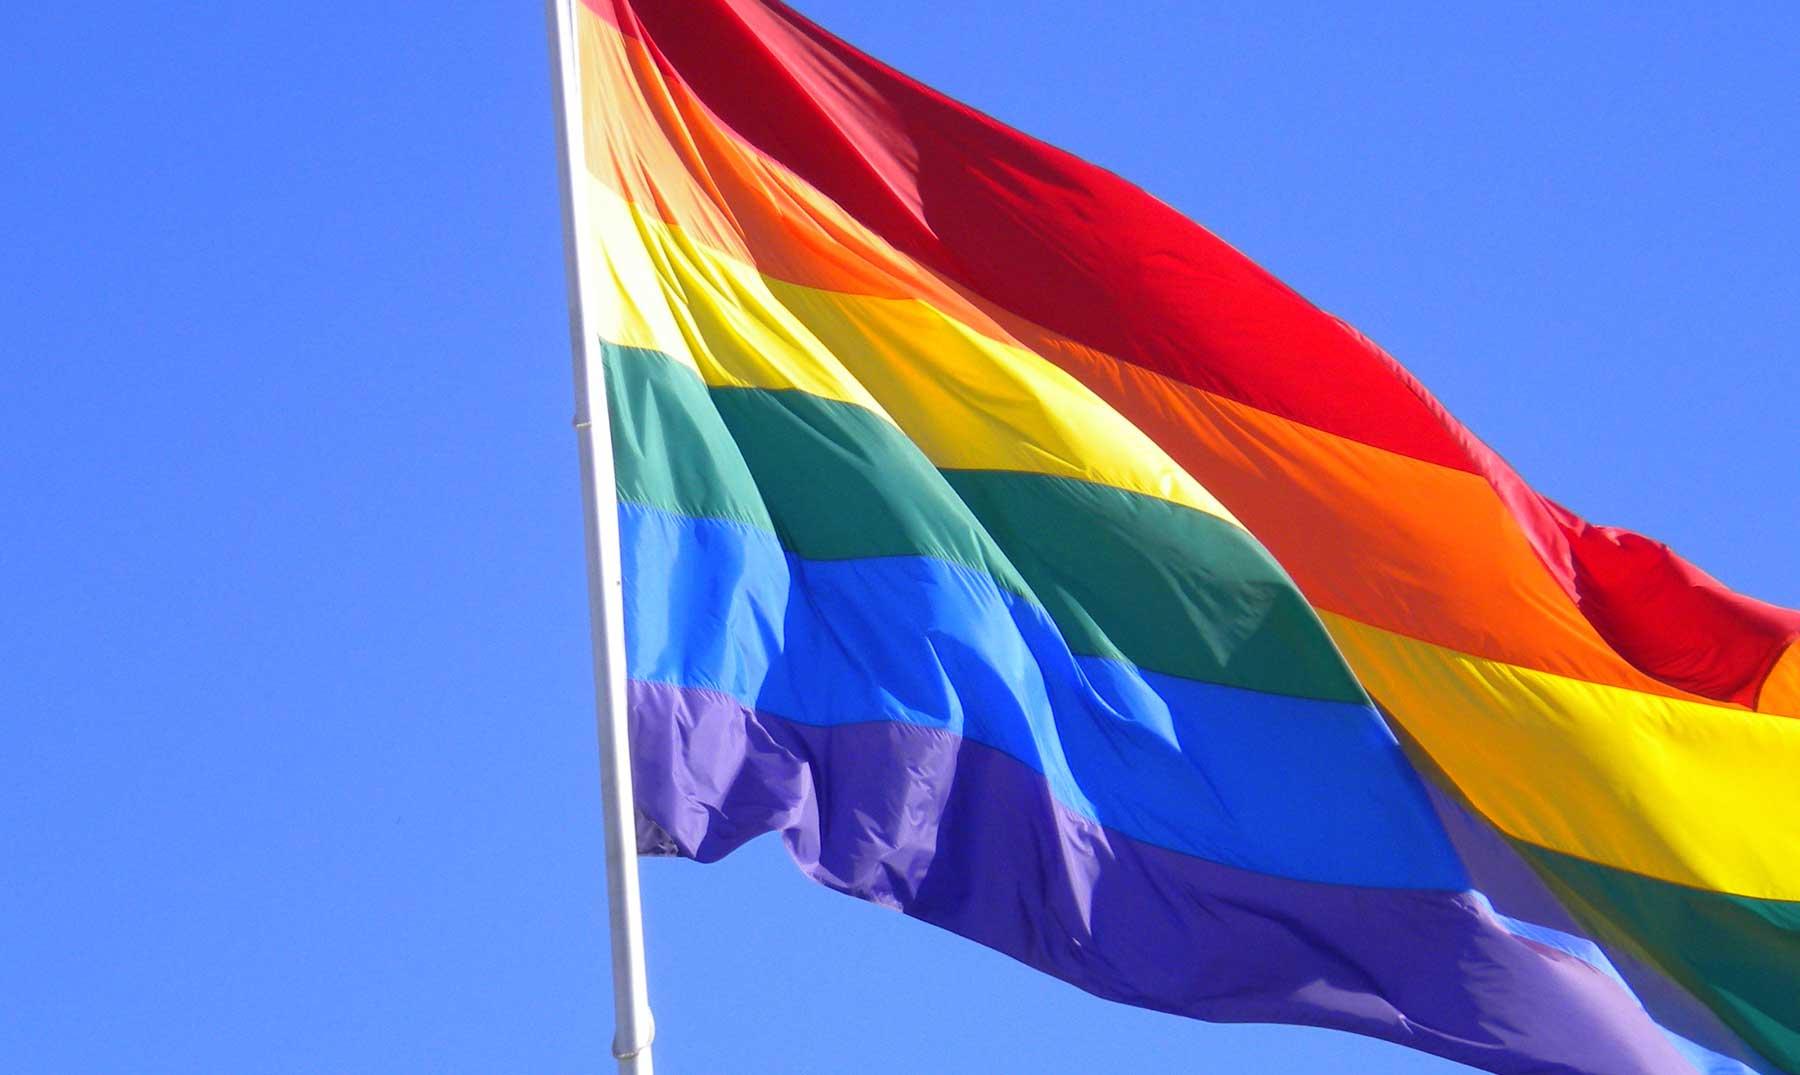 Segunda marcha del orgullo LGBT en Pergamino